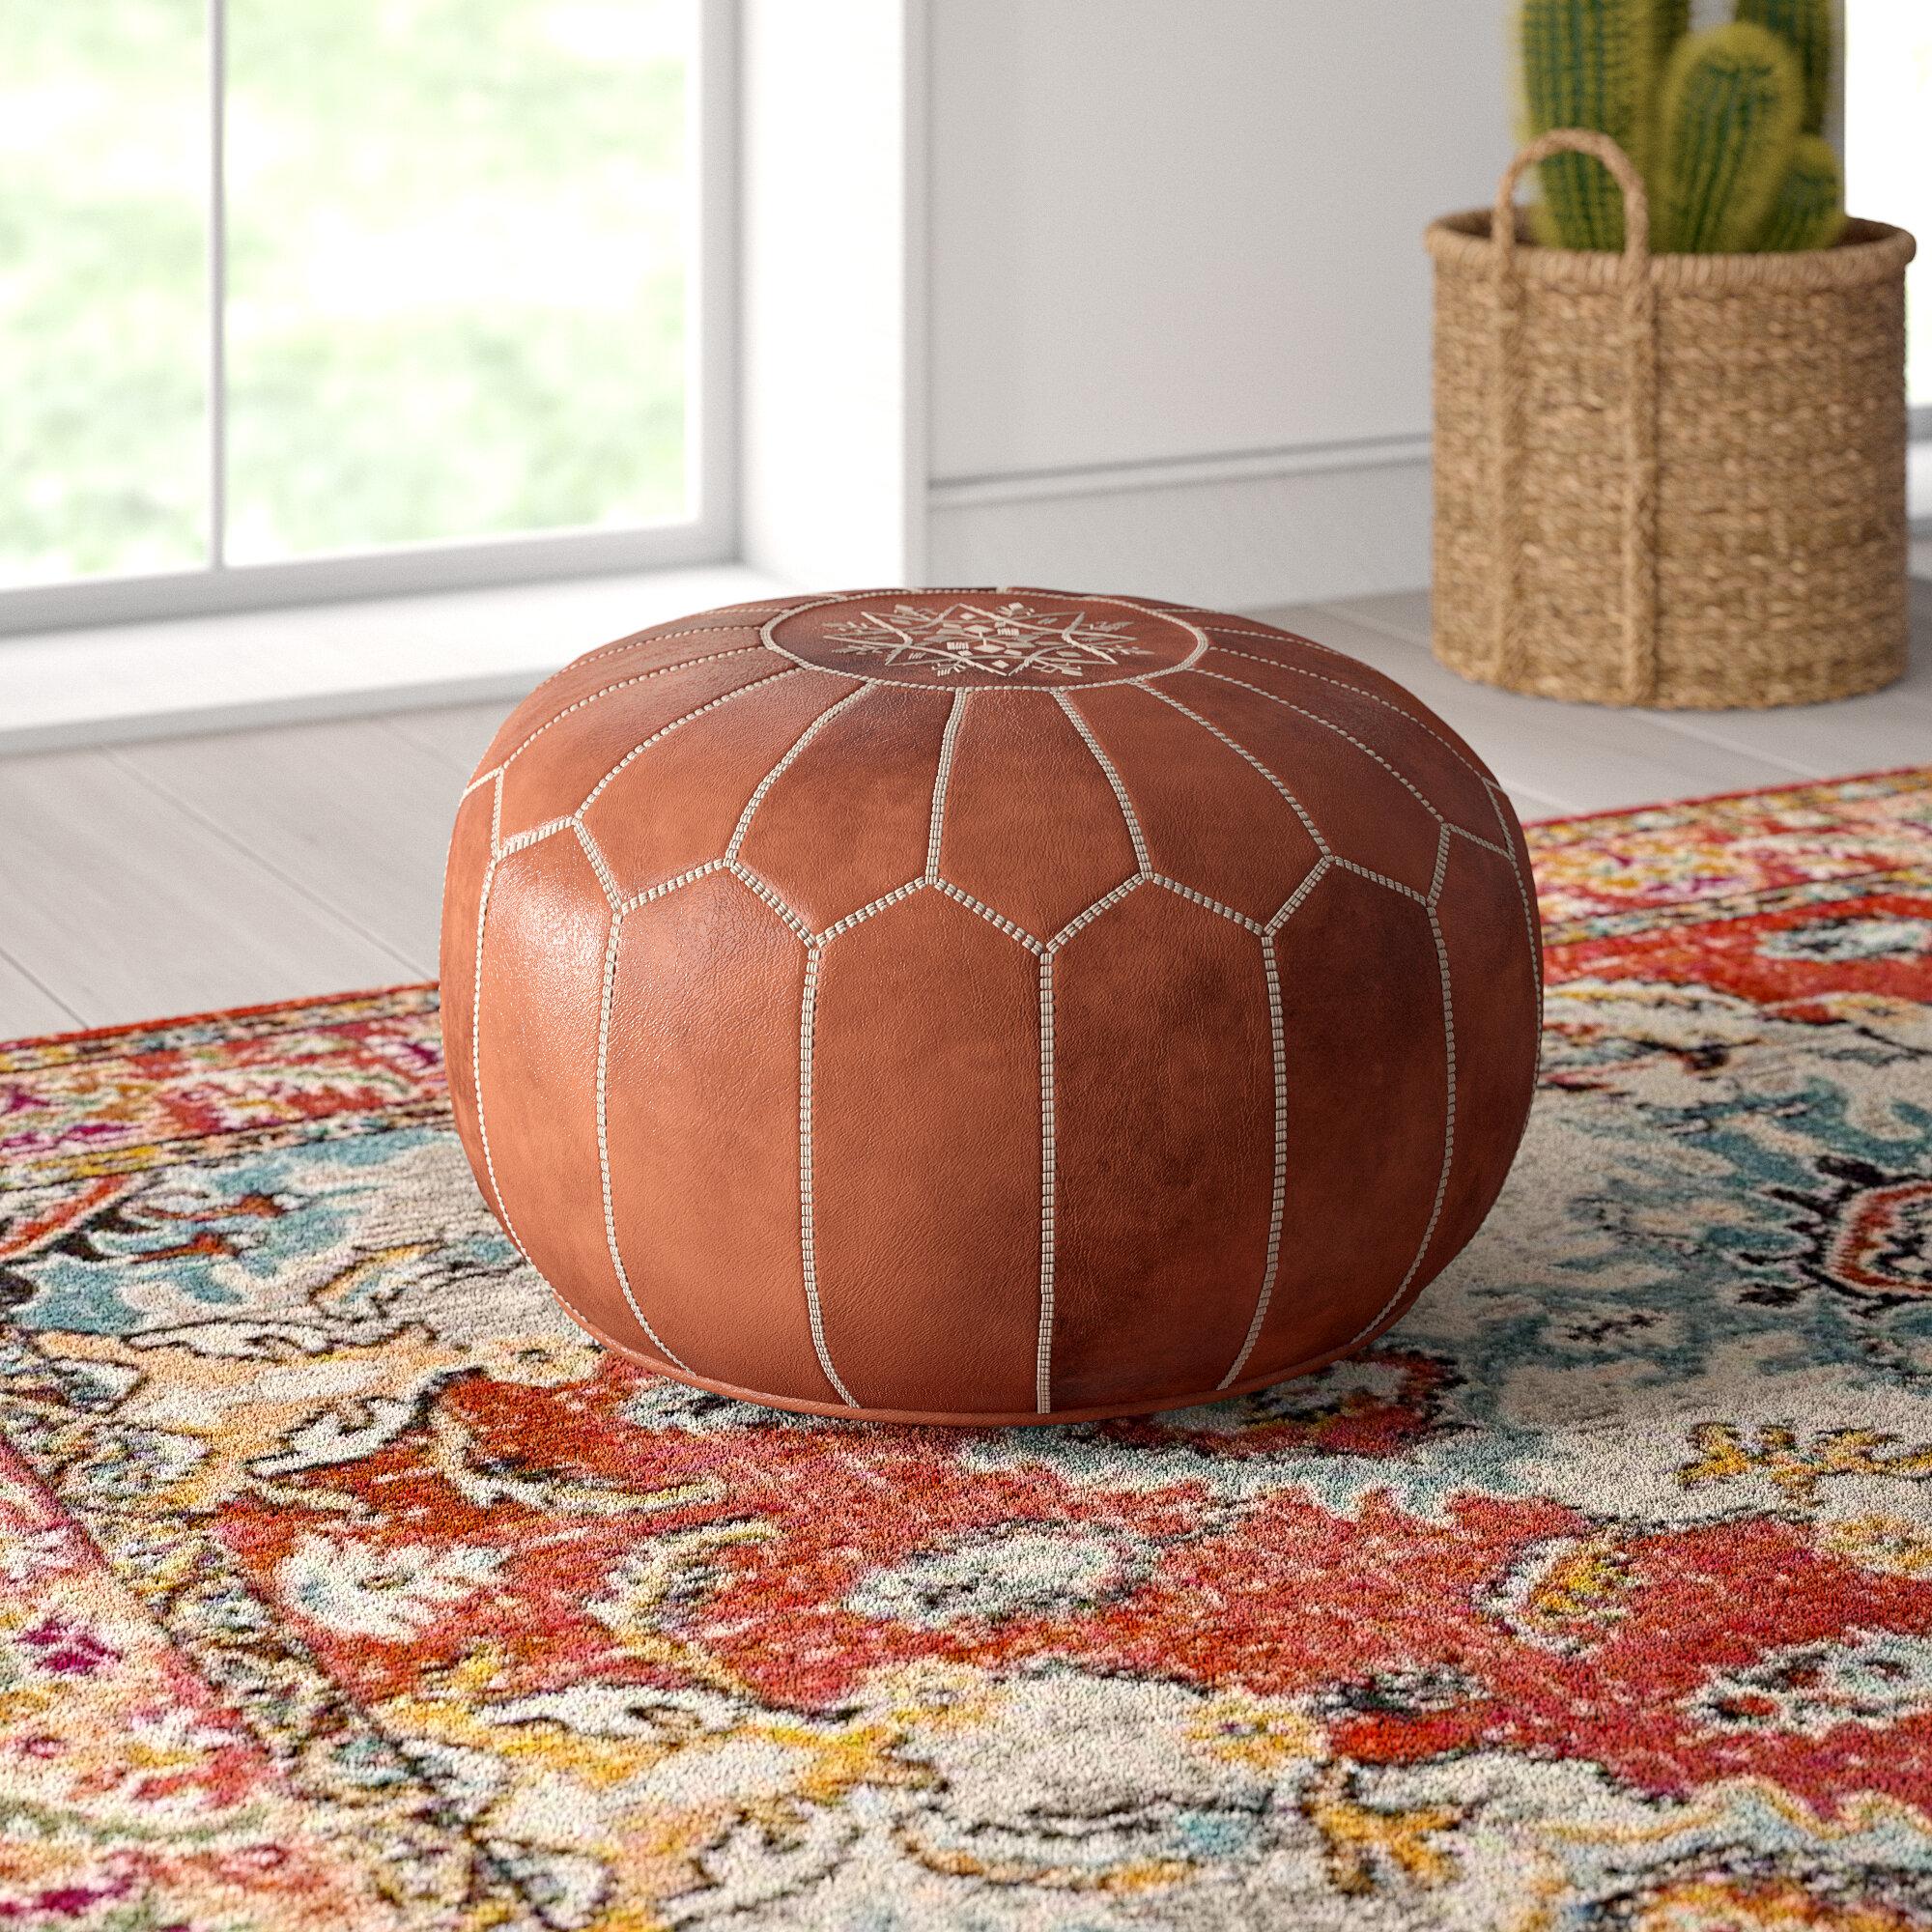 Sensational Carolos Leather Pouf Ncnpc Chair Design For Home Ncnpcorg